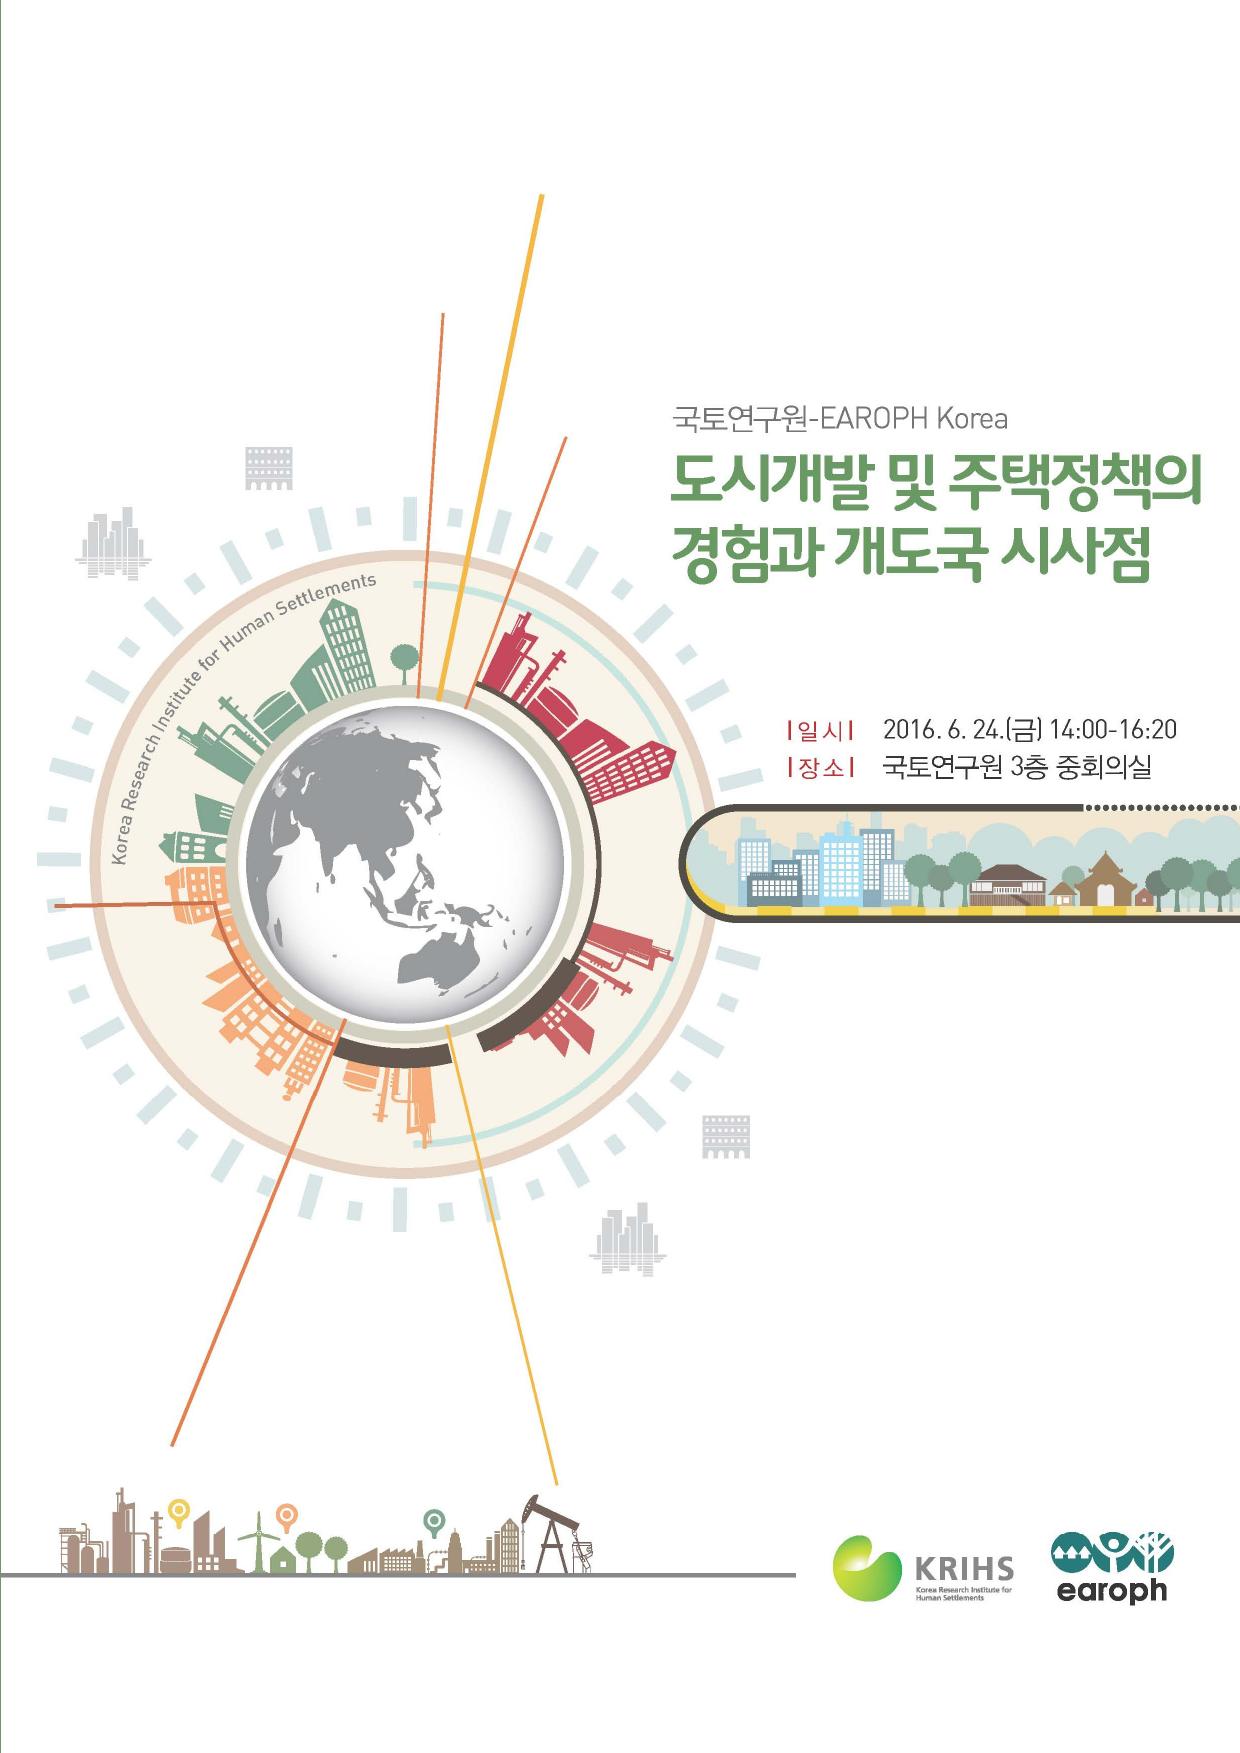 [KRIHS-Earoph Korea 정책세미나] 도시개발 및 주택정책의 경험과 개도국 시사점표지